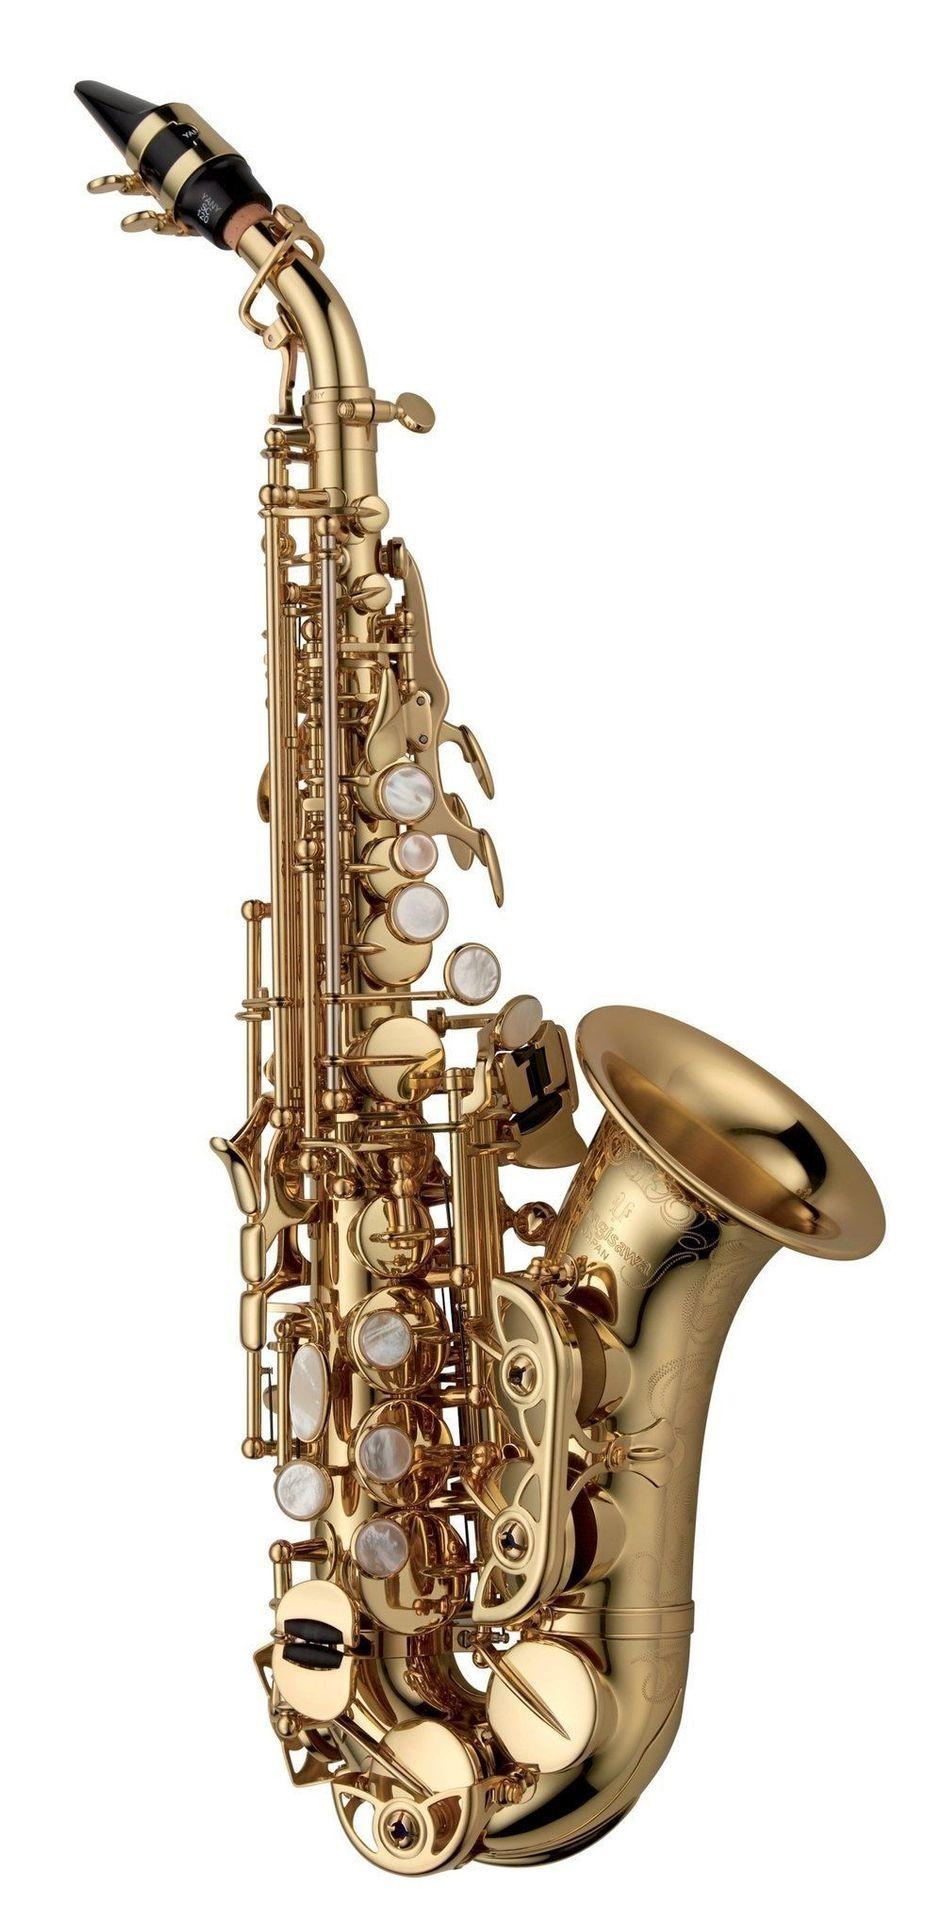 Yanagisawa SC-WO10 Sopransaxophon, gebogen, incl. Etui u. Zubehör